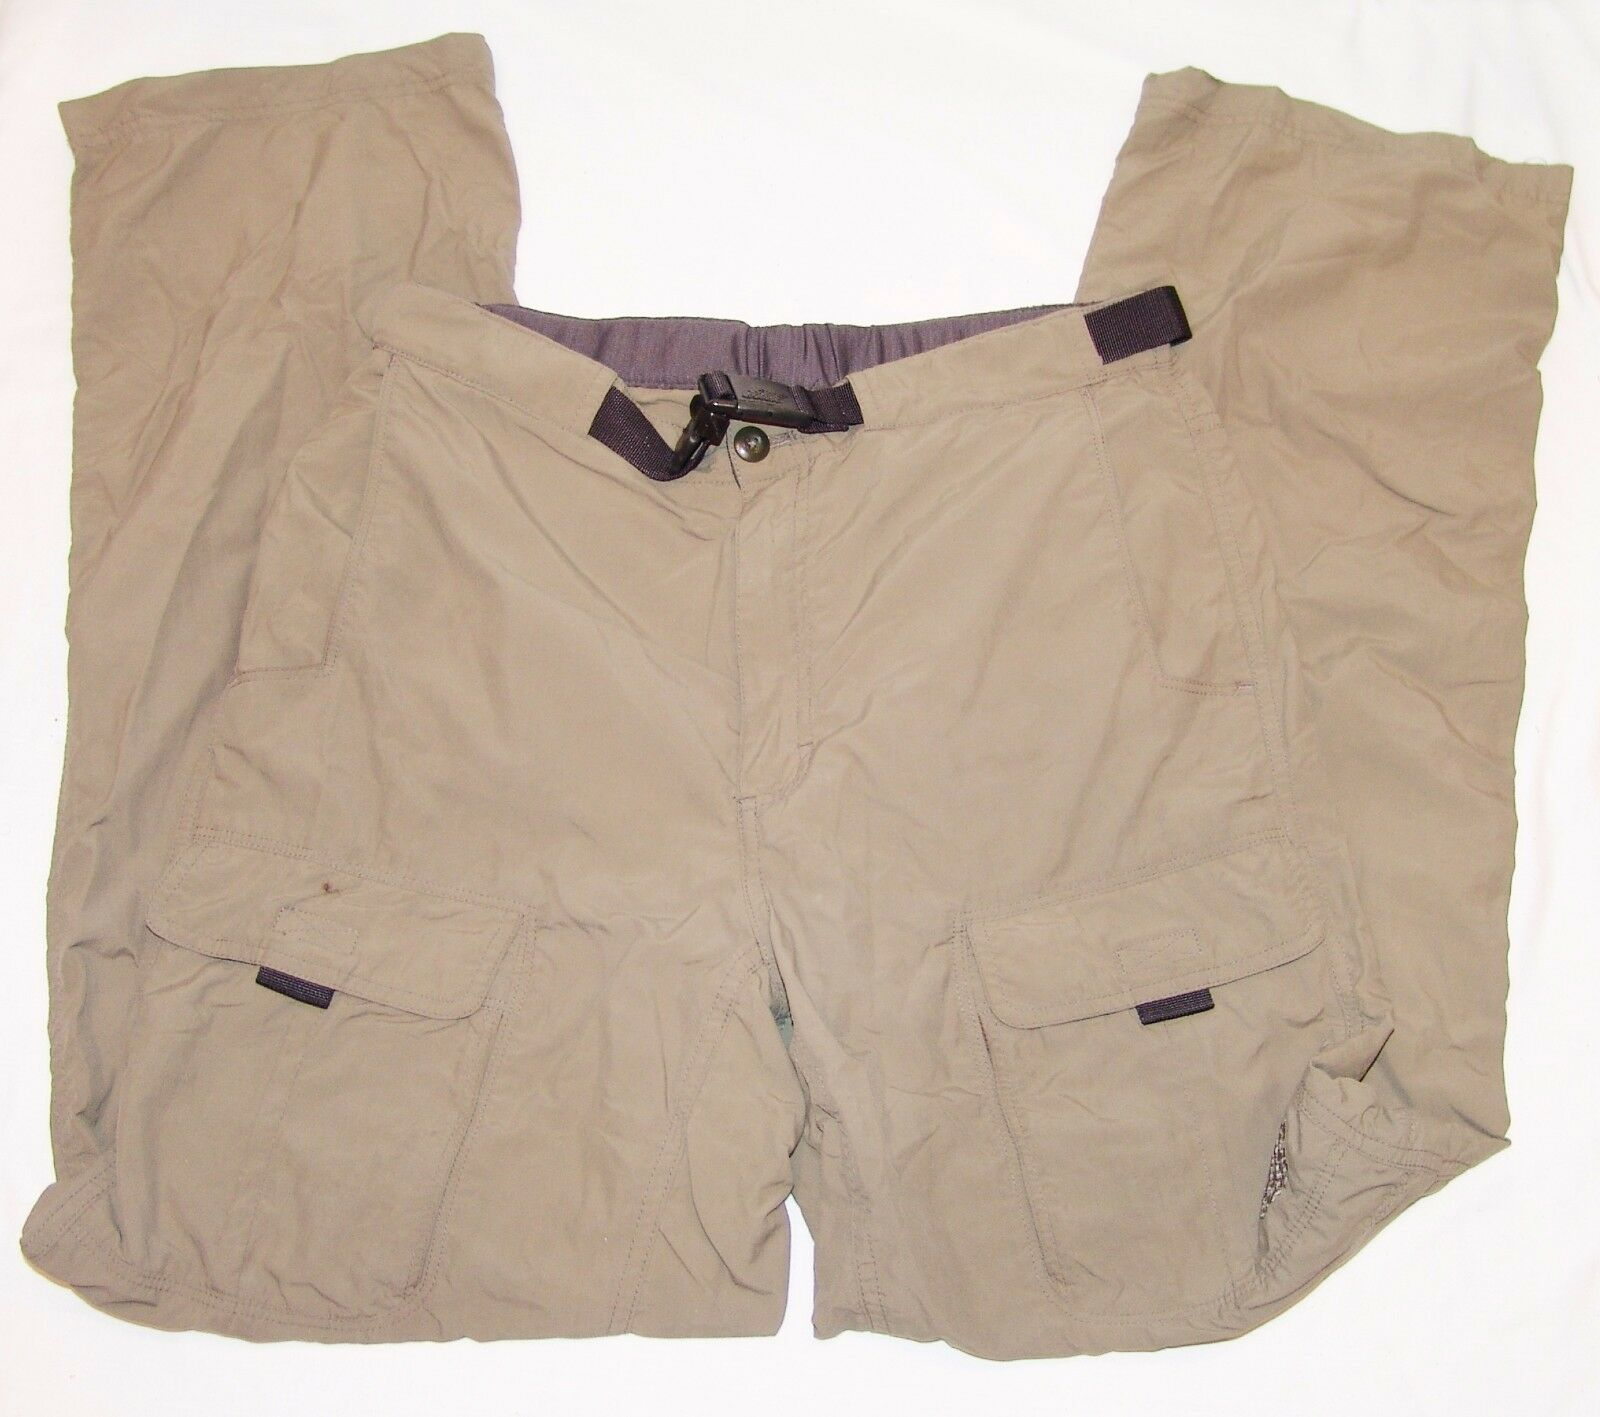 Eastrn Mntn Sprts Khaki Mountain Sports Mens Hiking Pants 30R 30 Regular Nylon